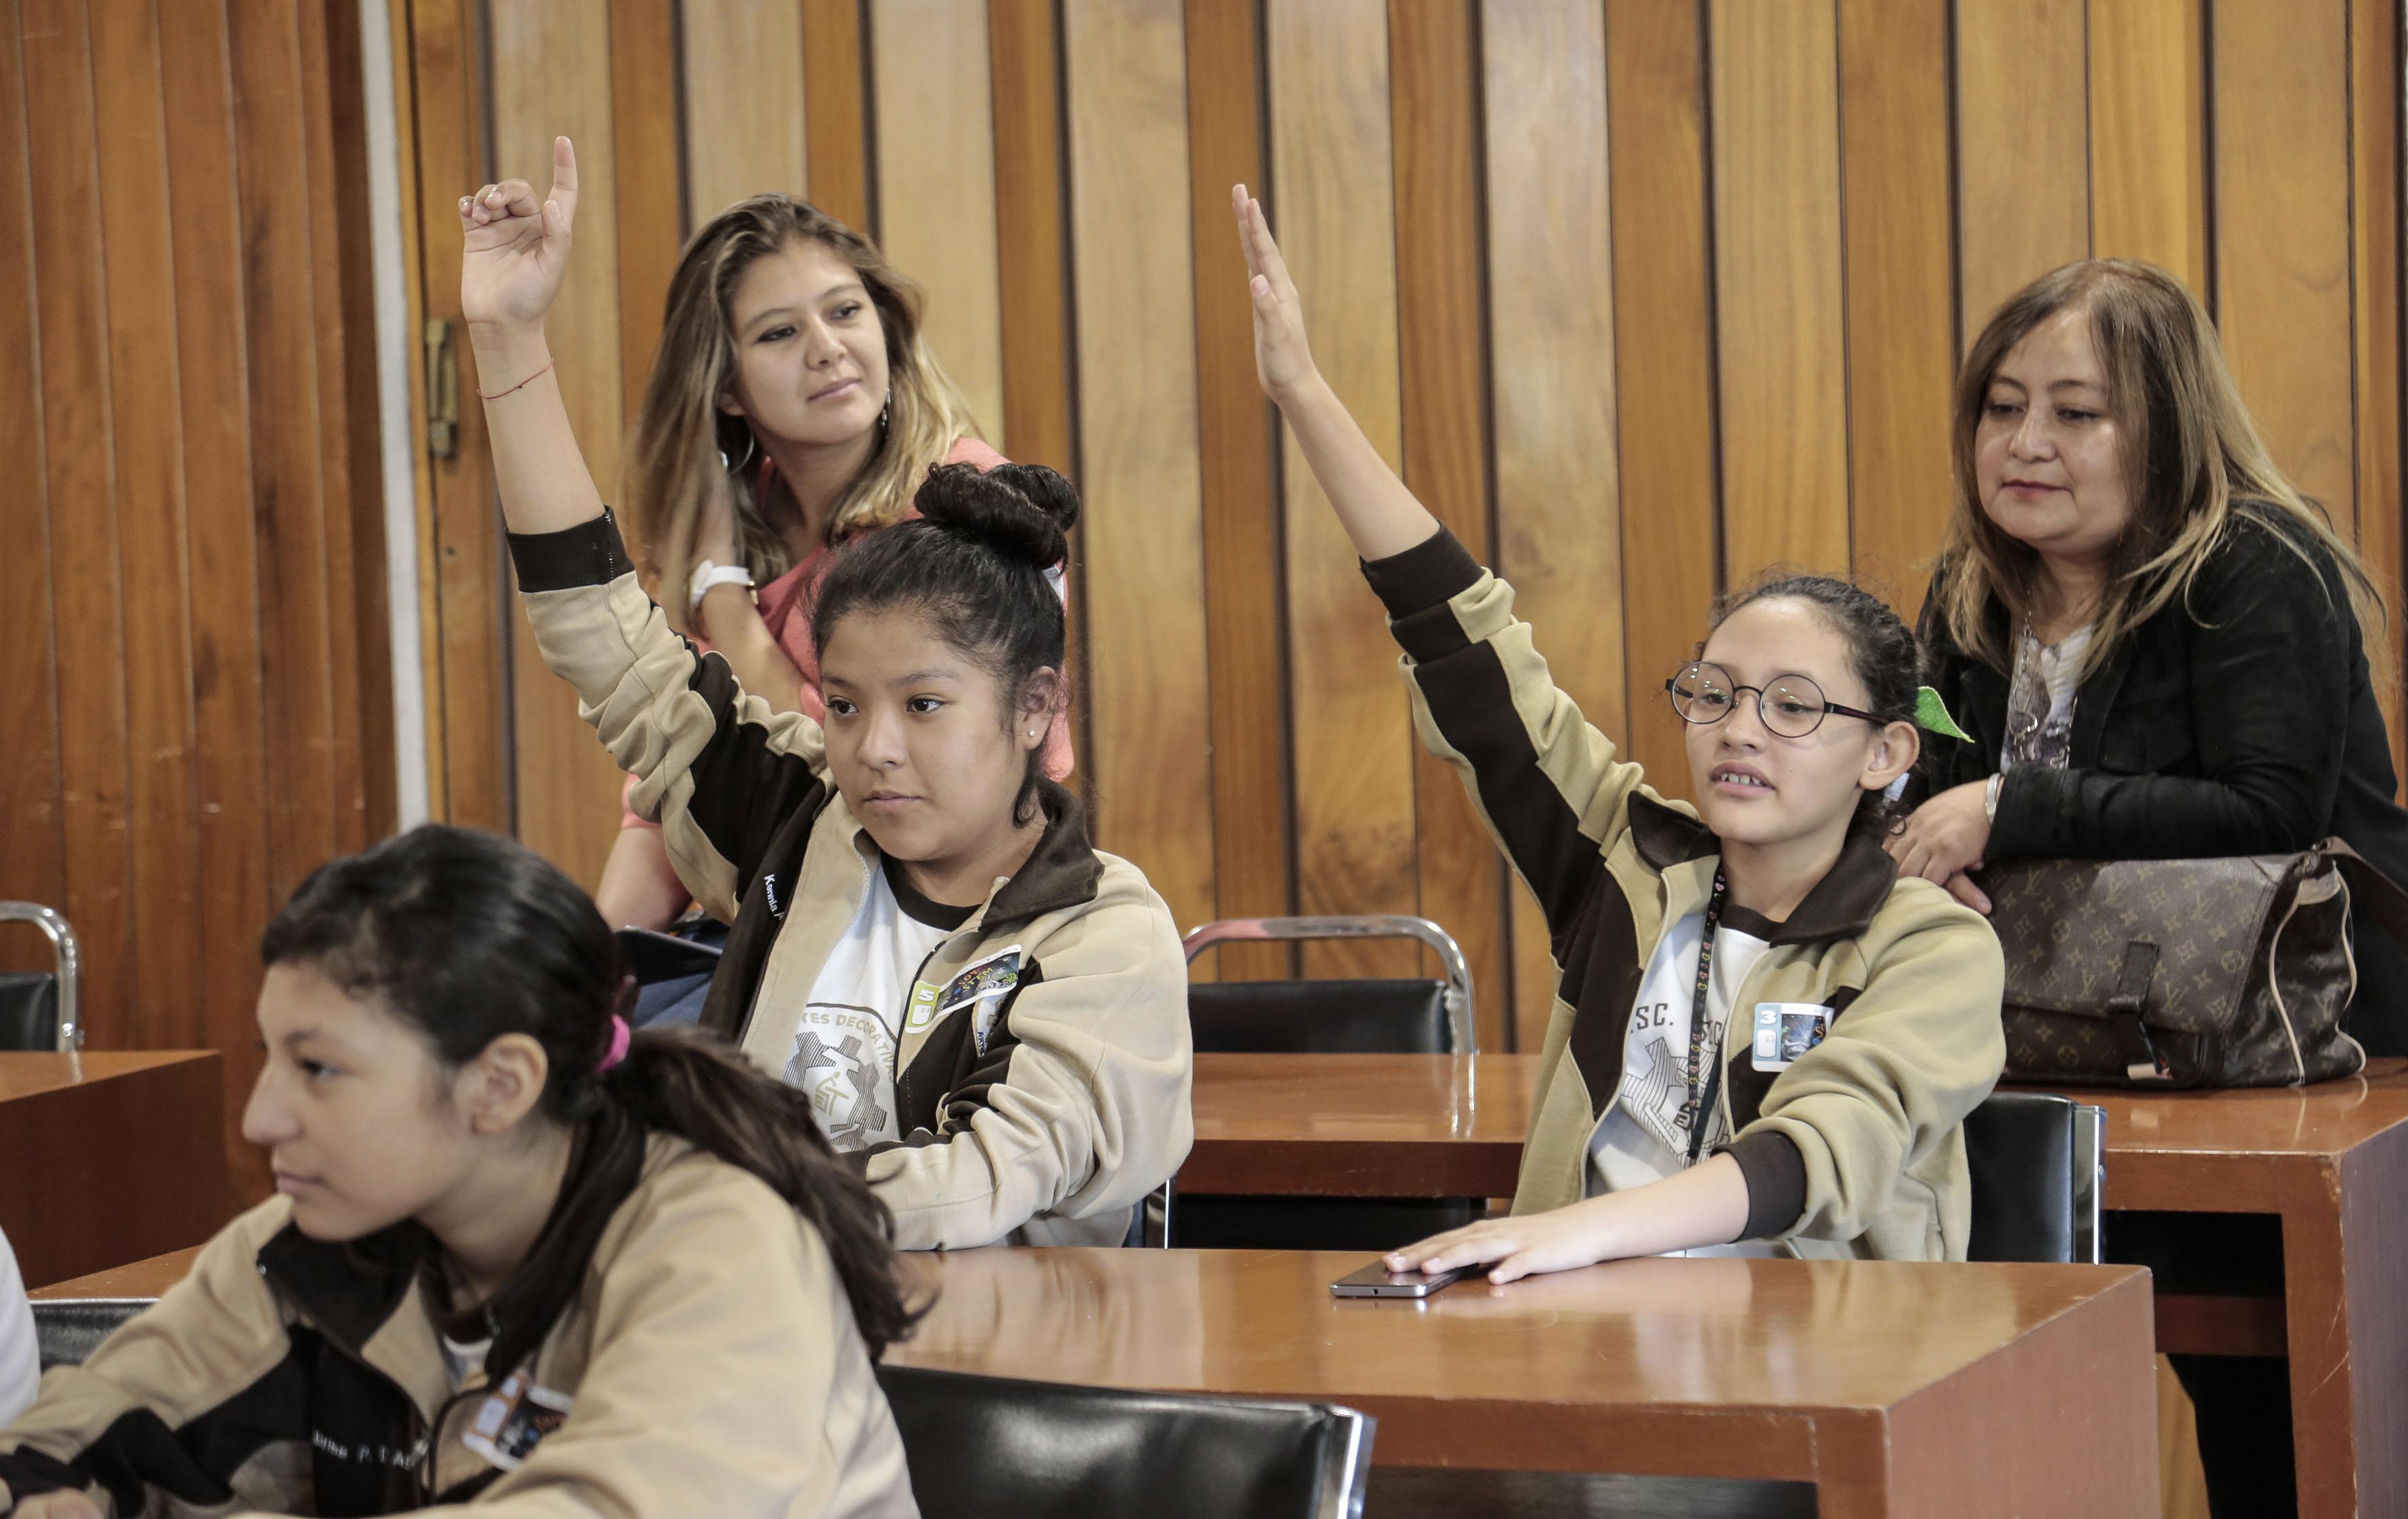 alumnos de secundaria tecnica participando en conferencia